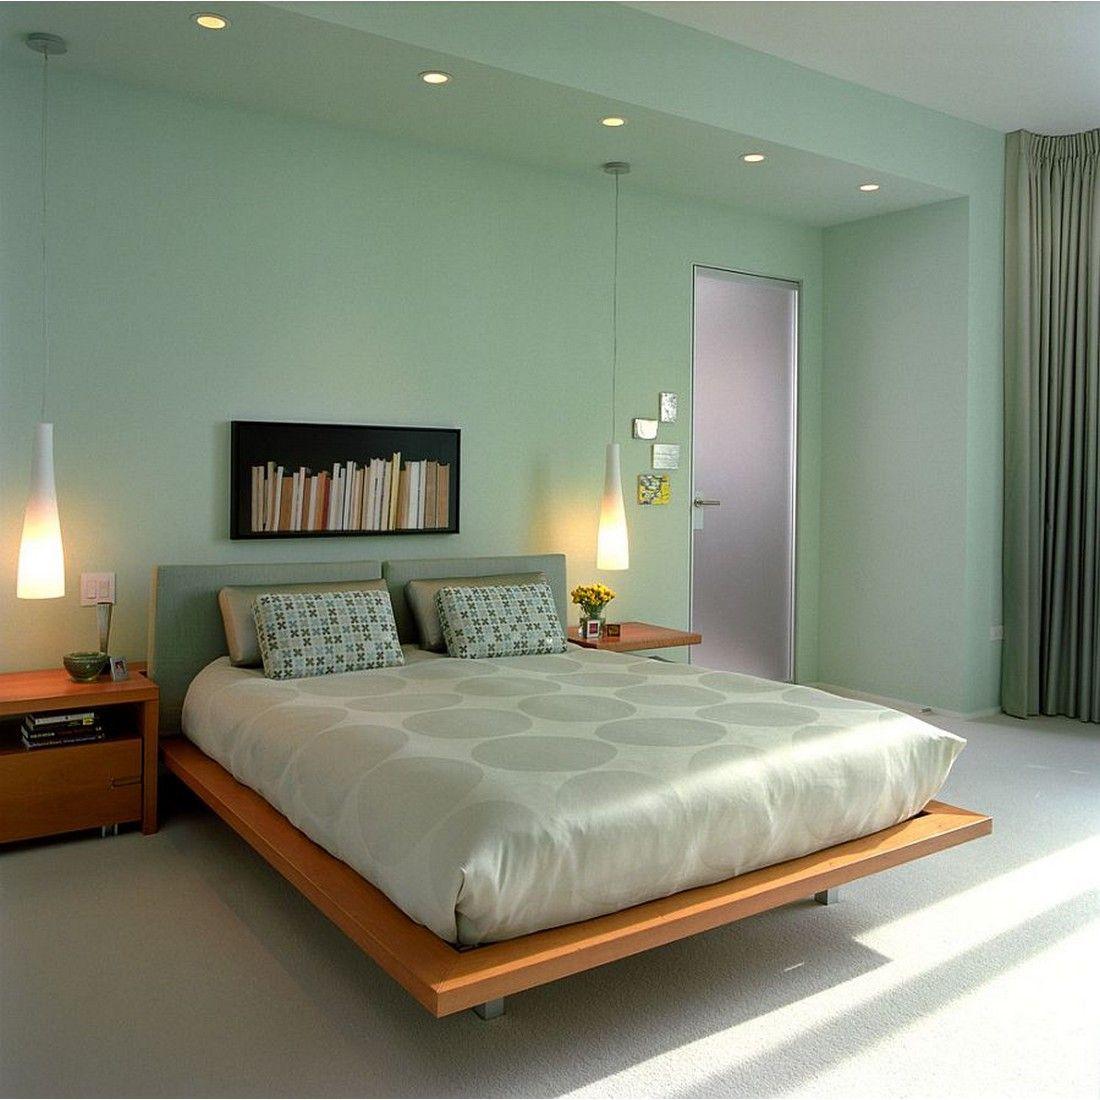 Modern Minimalist Bedroom In Soft Green Yay Or Nay Rumahkubedroom Green Bedroom Walls Mint Green Bedroom Seafoam Green Bedroom